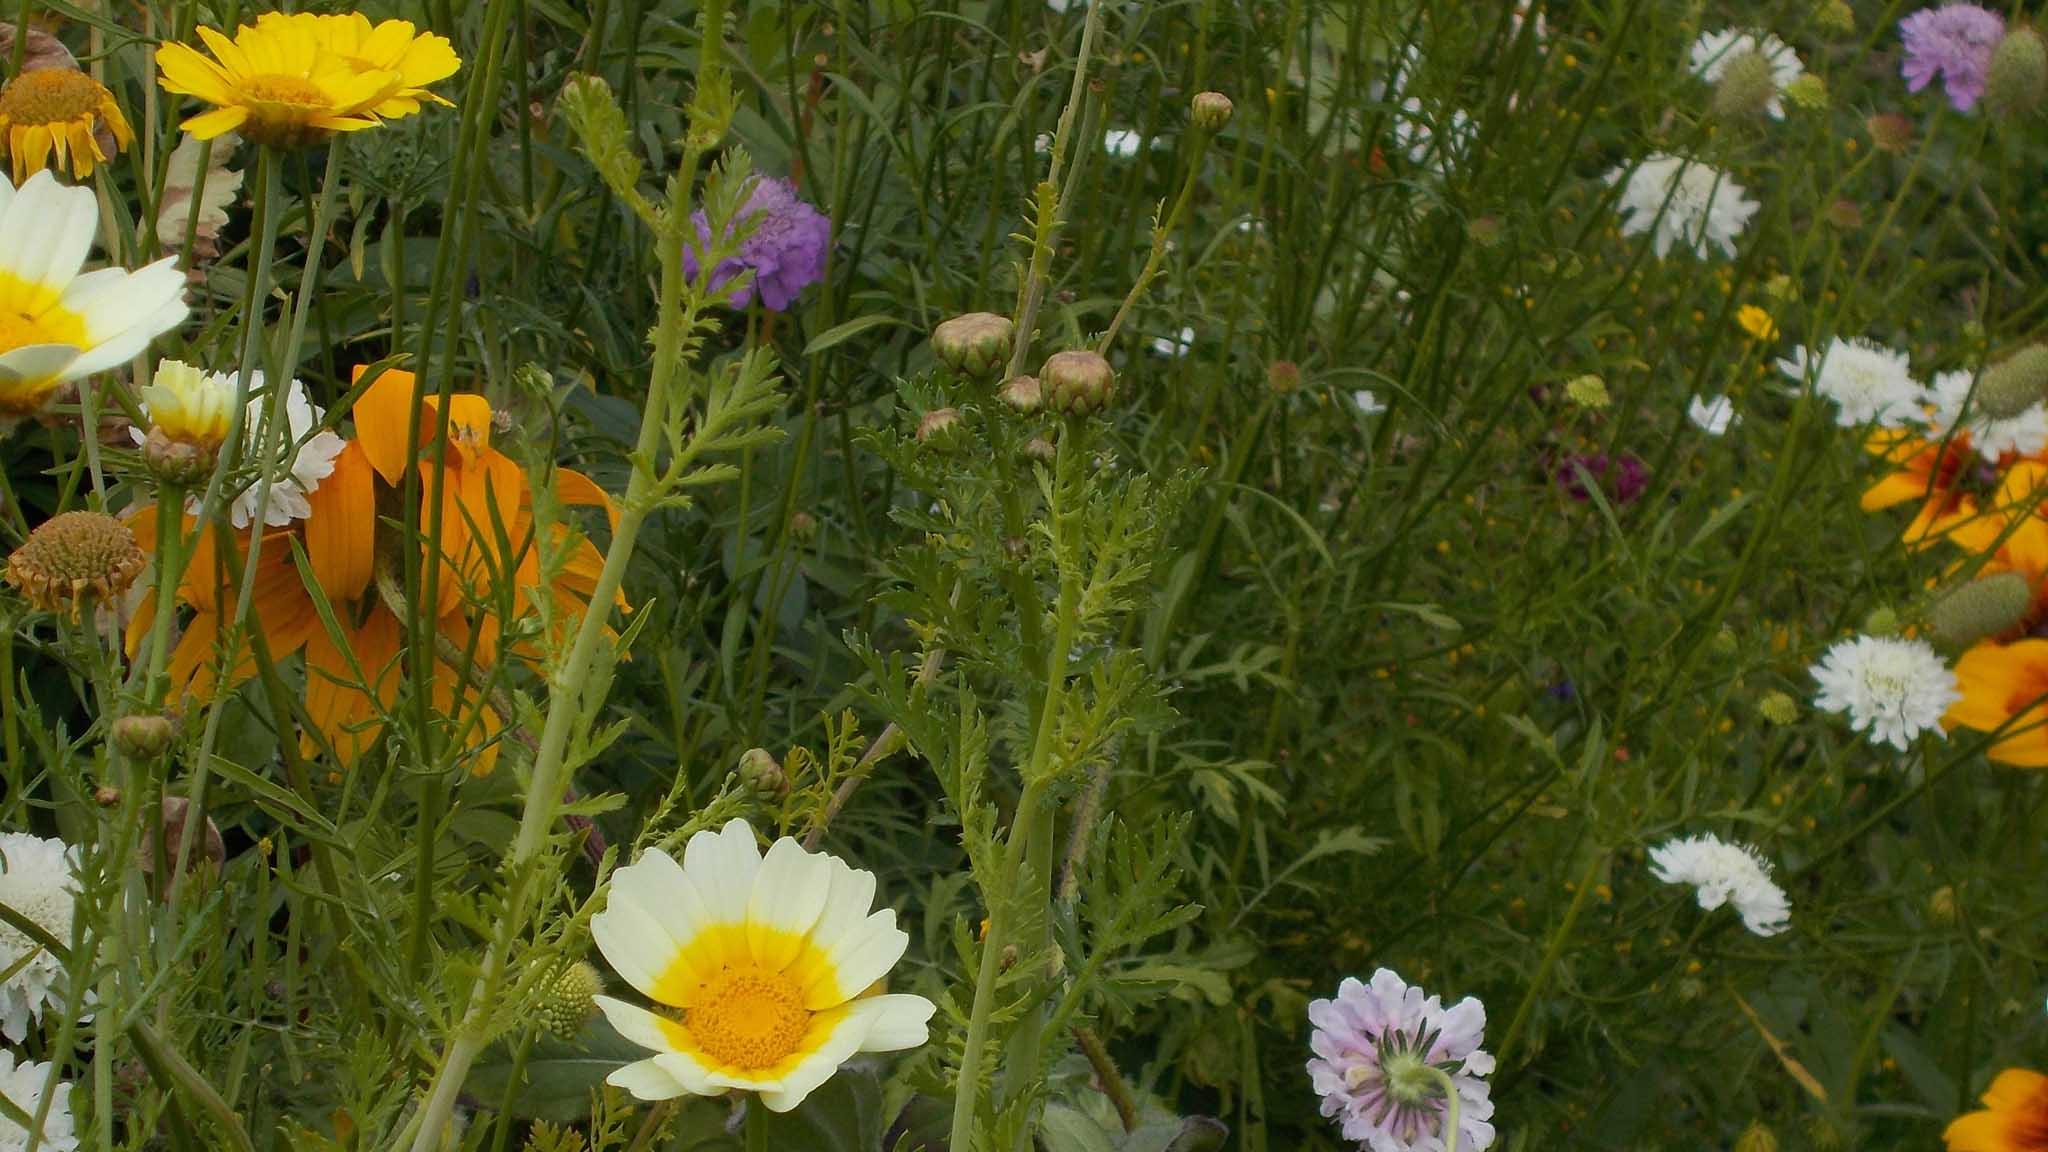 Walled Garden wildflowers